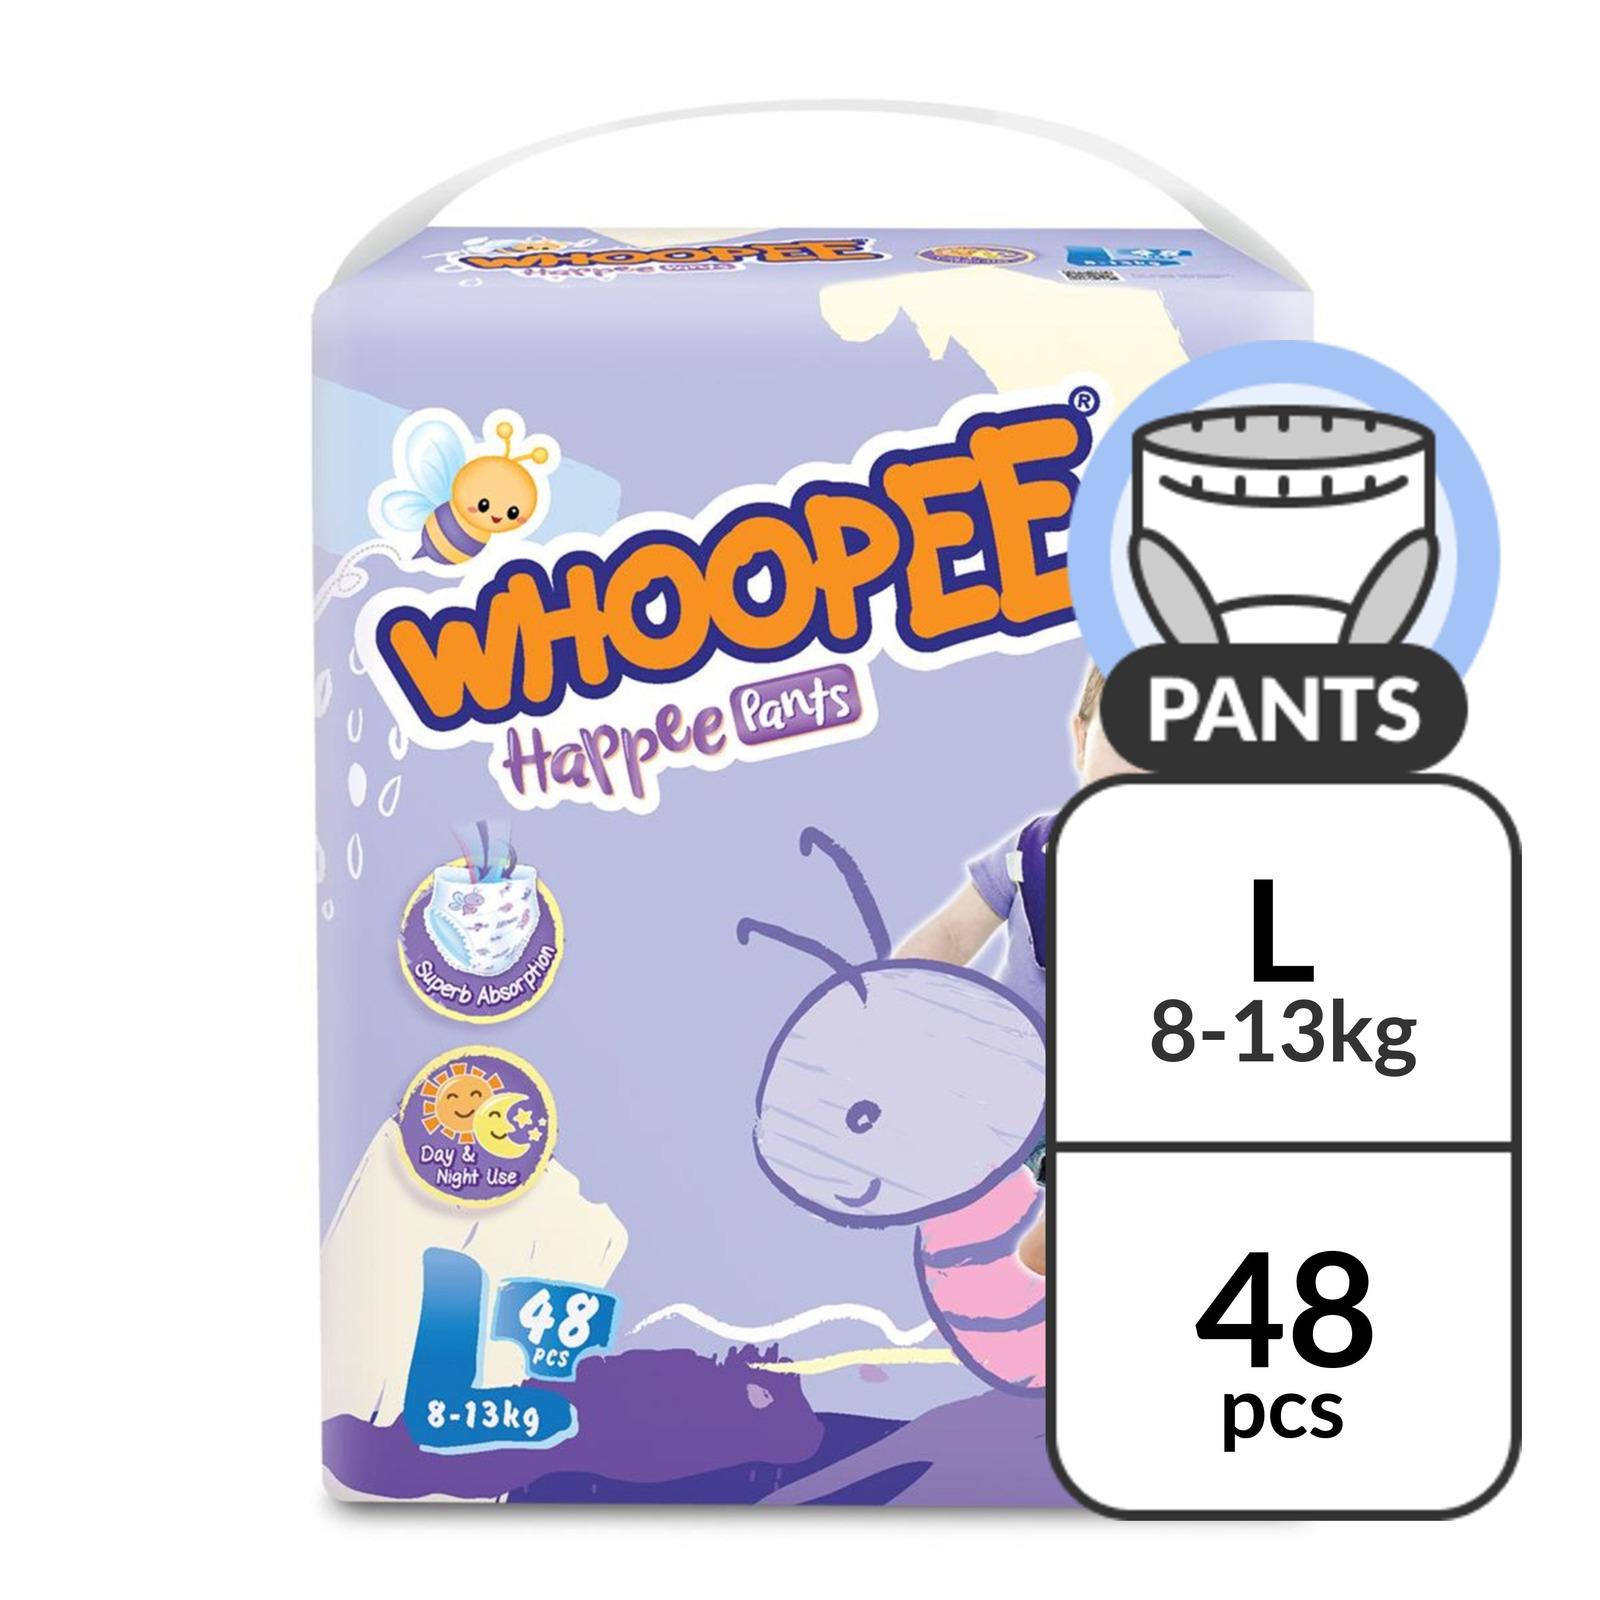 OJI Whoopee Mega Pack Pants L - (8-13kg)